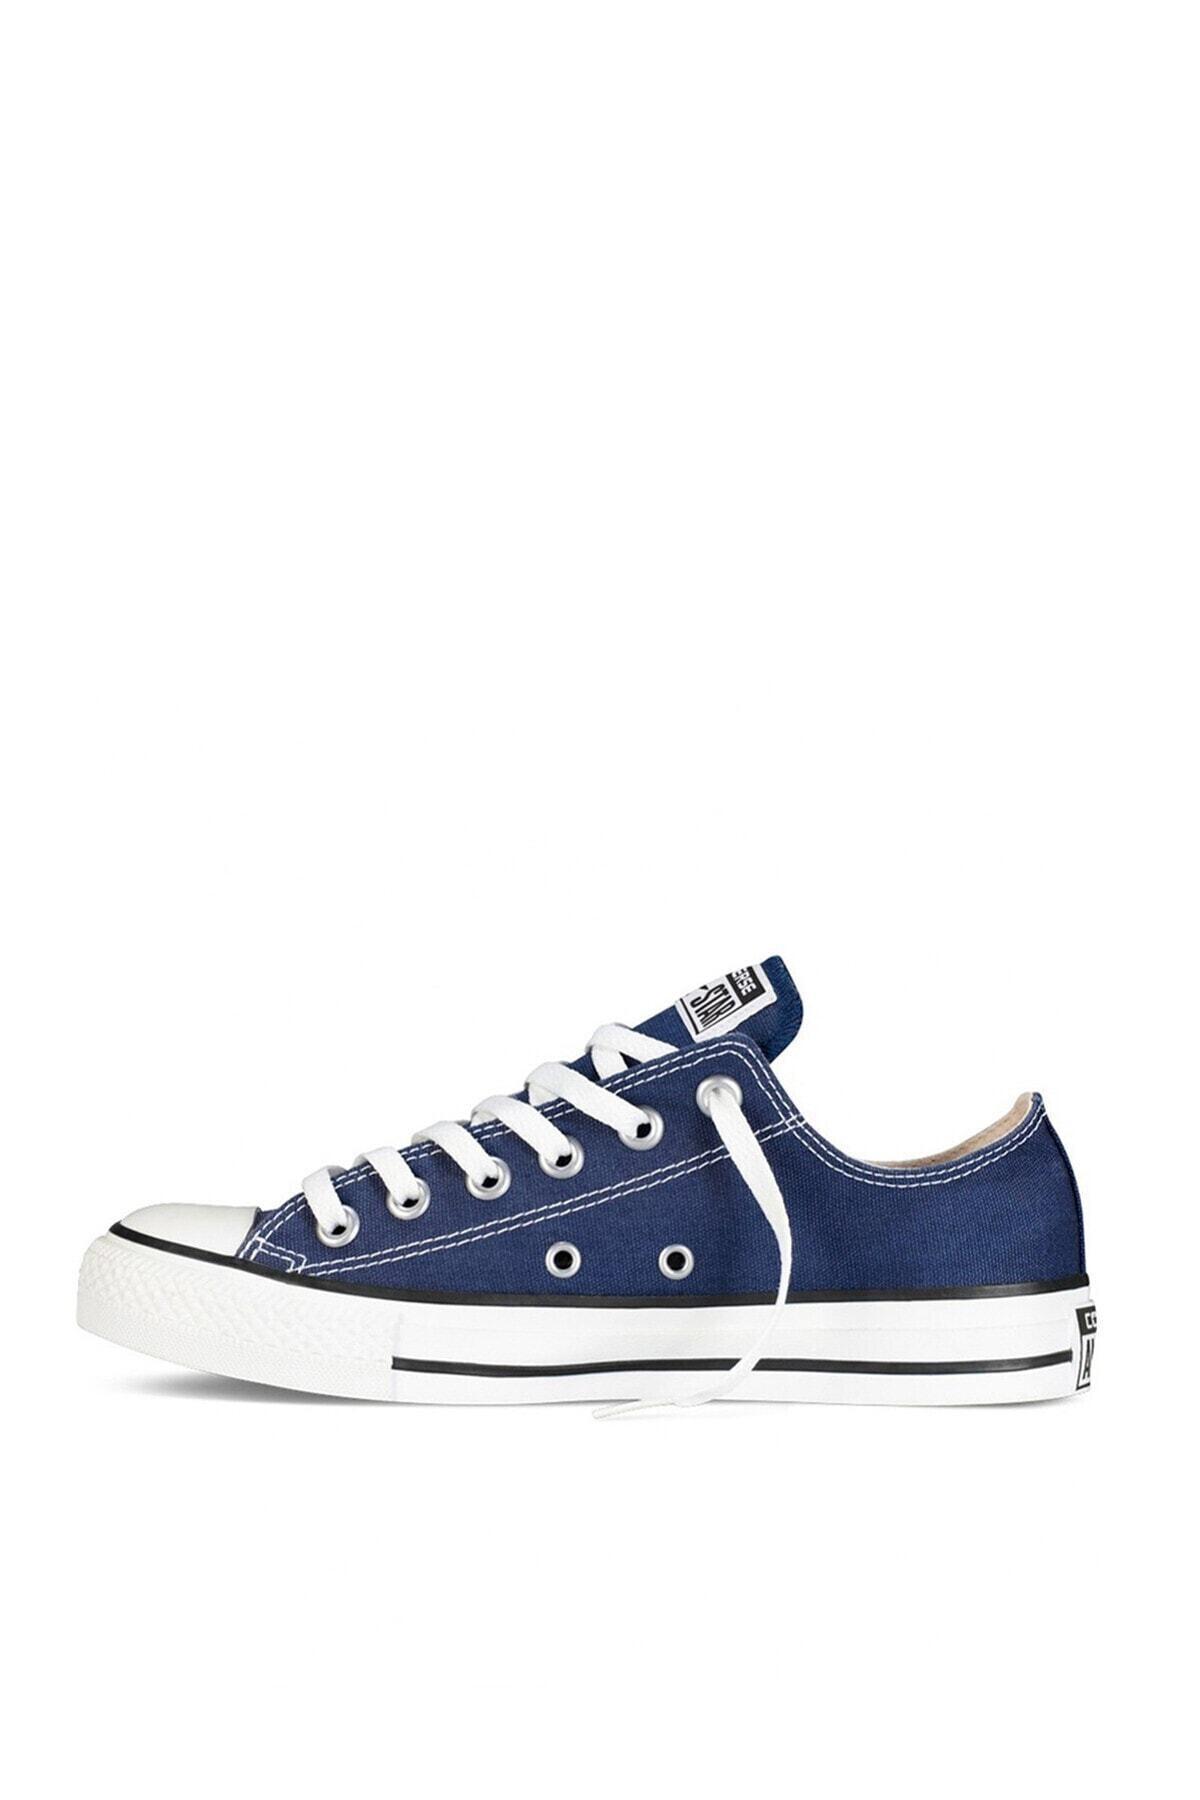 converse Unisex Mavi Allstar Chuck Taylor Sneaker M9697cc 2